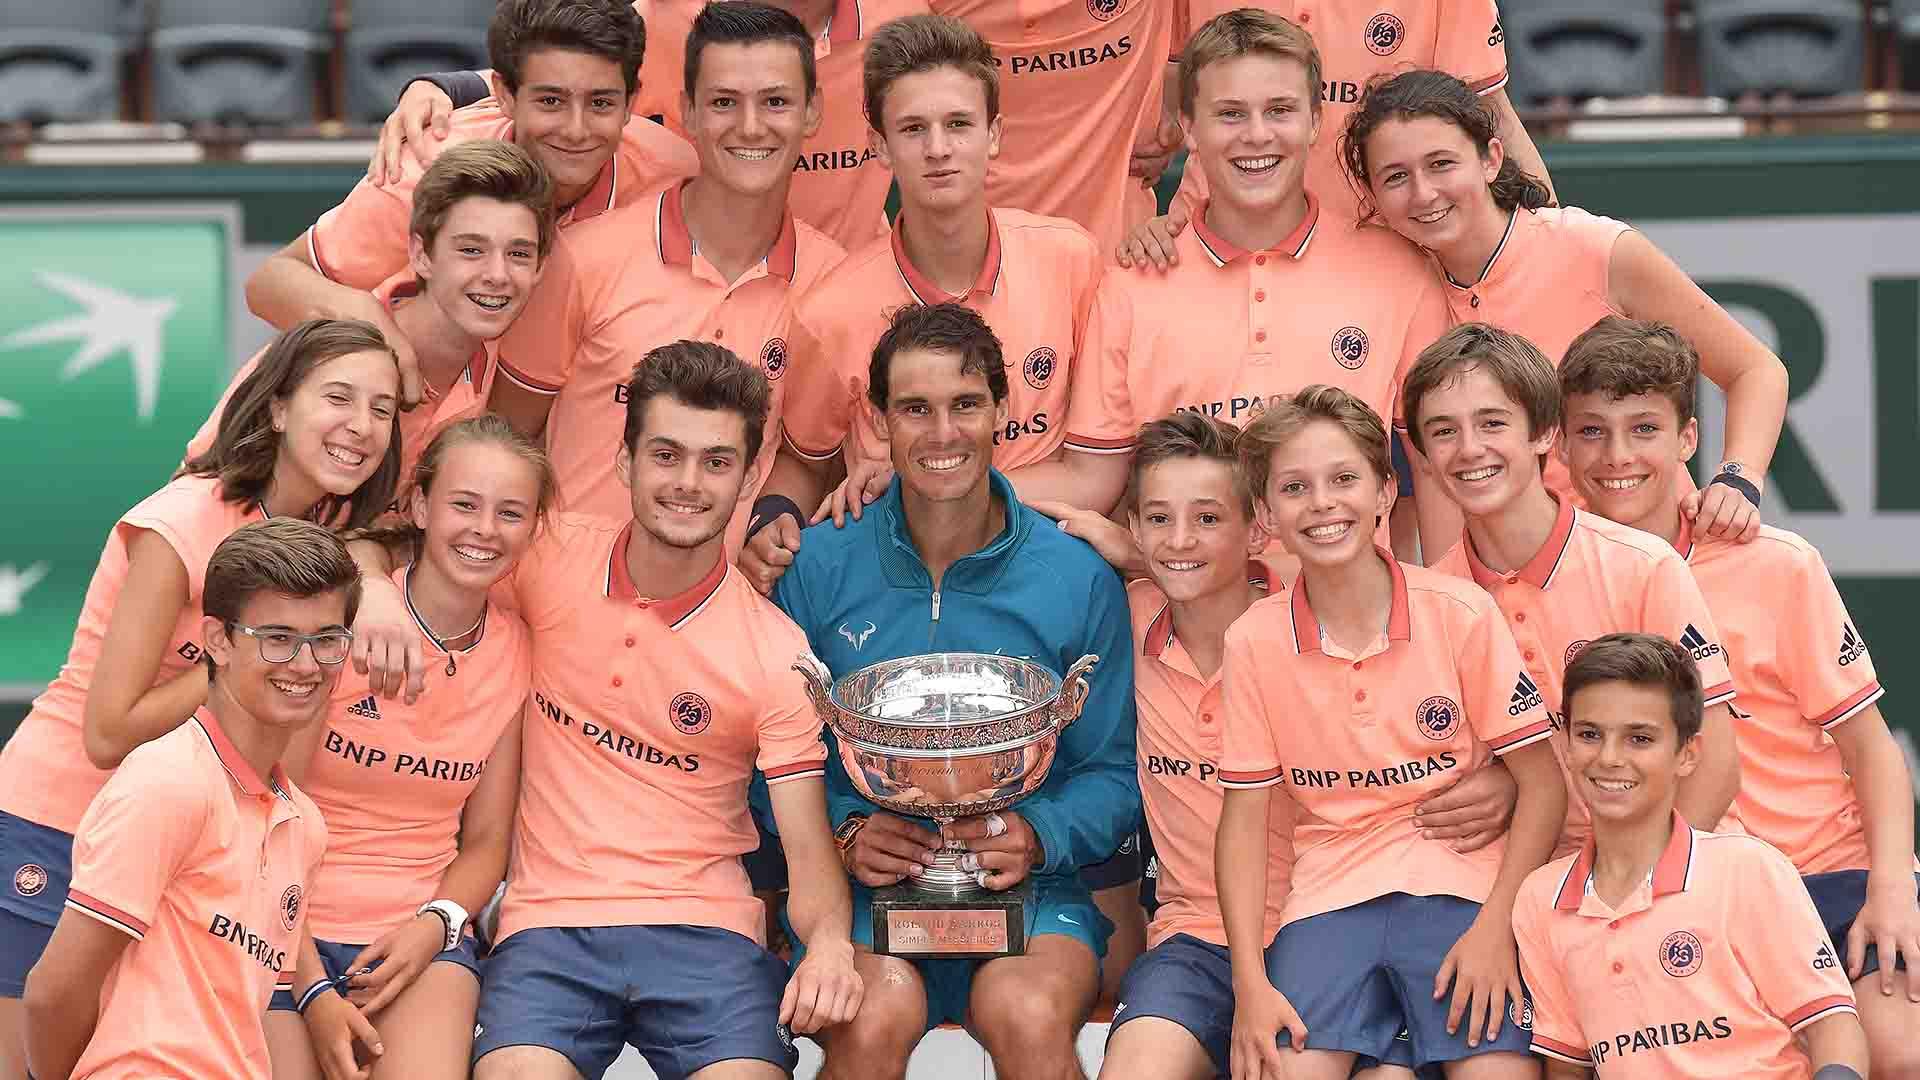 Madrid Open Tennis tournament  - Cover